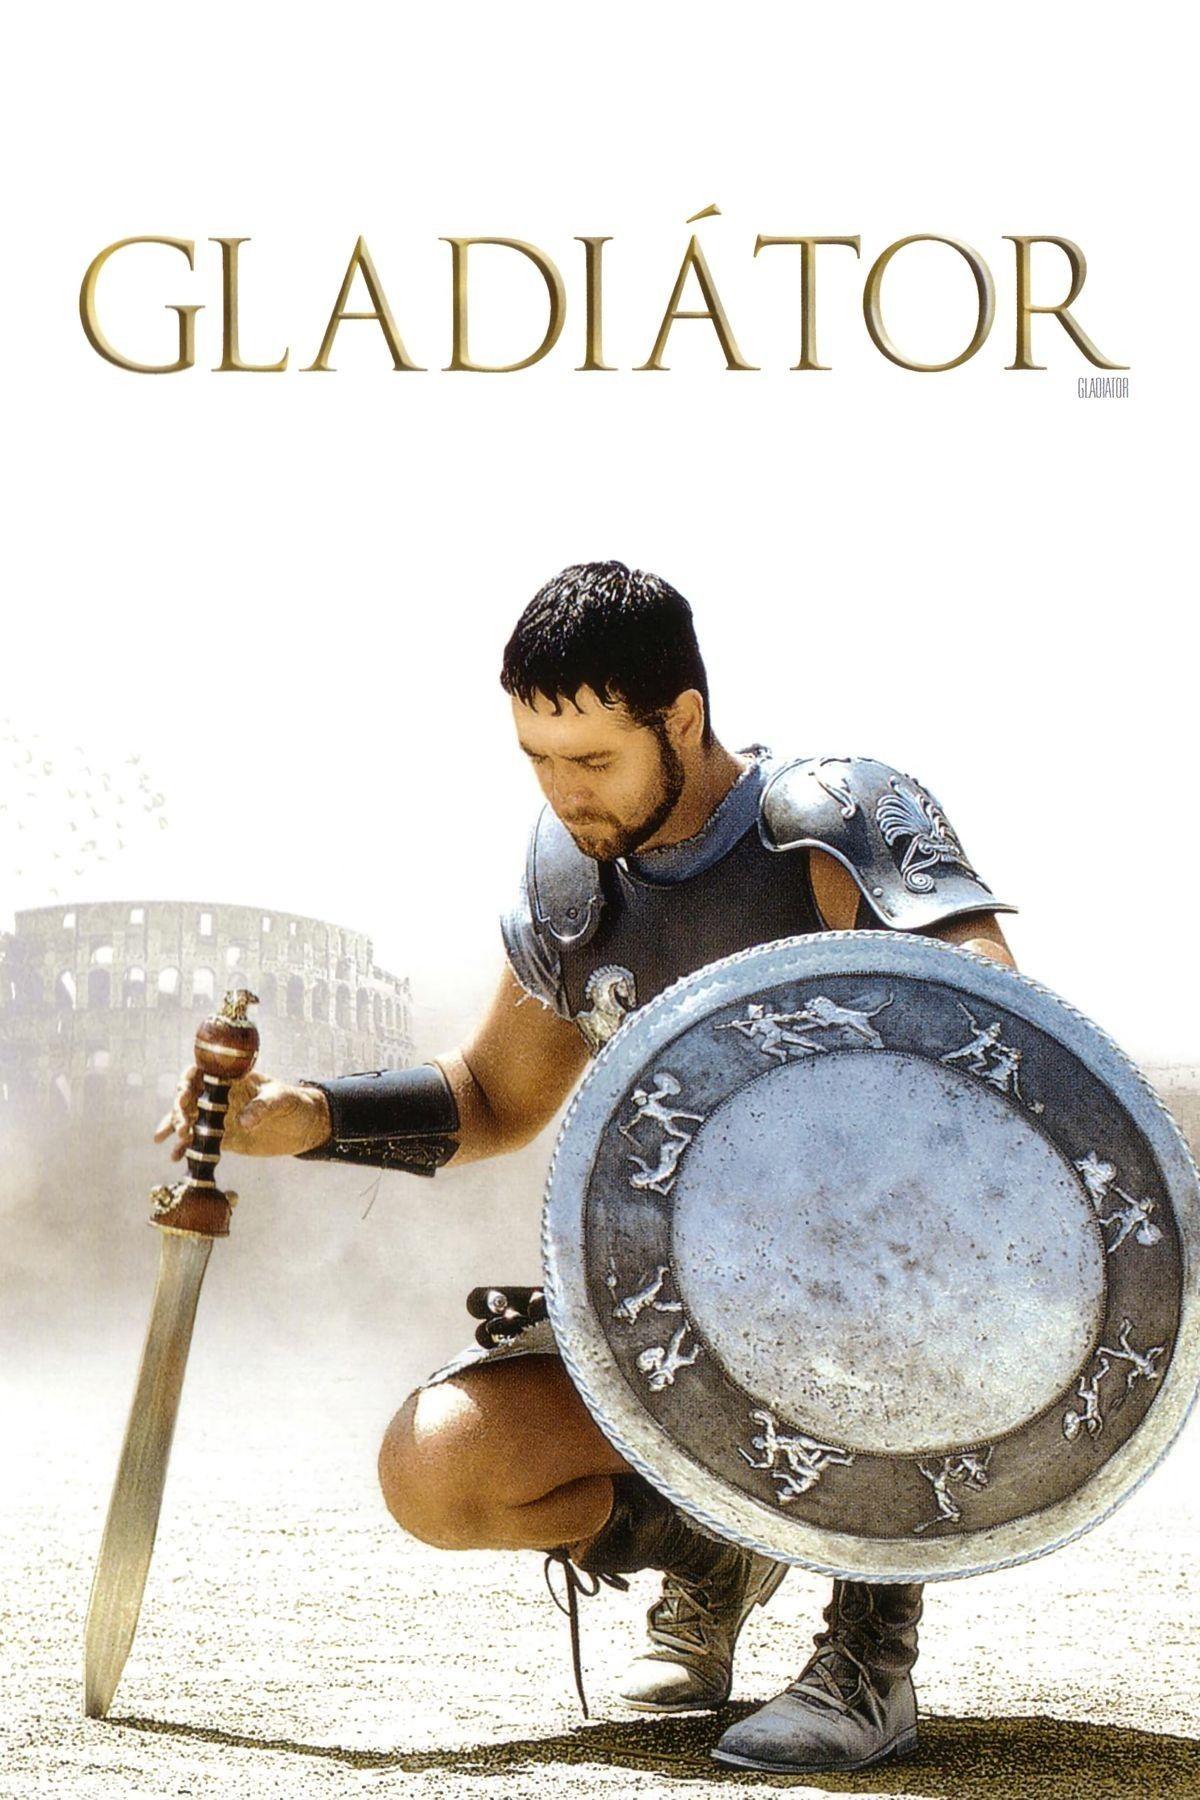 Maximo Decimus Meridius Gladiator Gladiador Pelicula Fondos De Cine Maximo Decimo Meridio